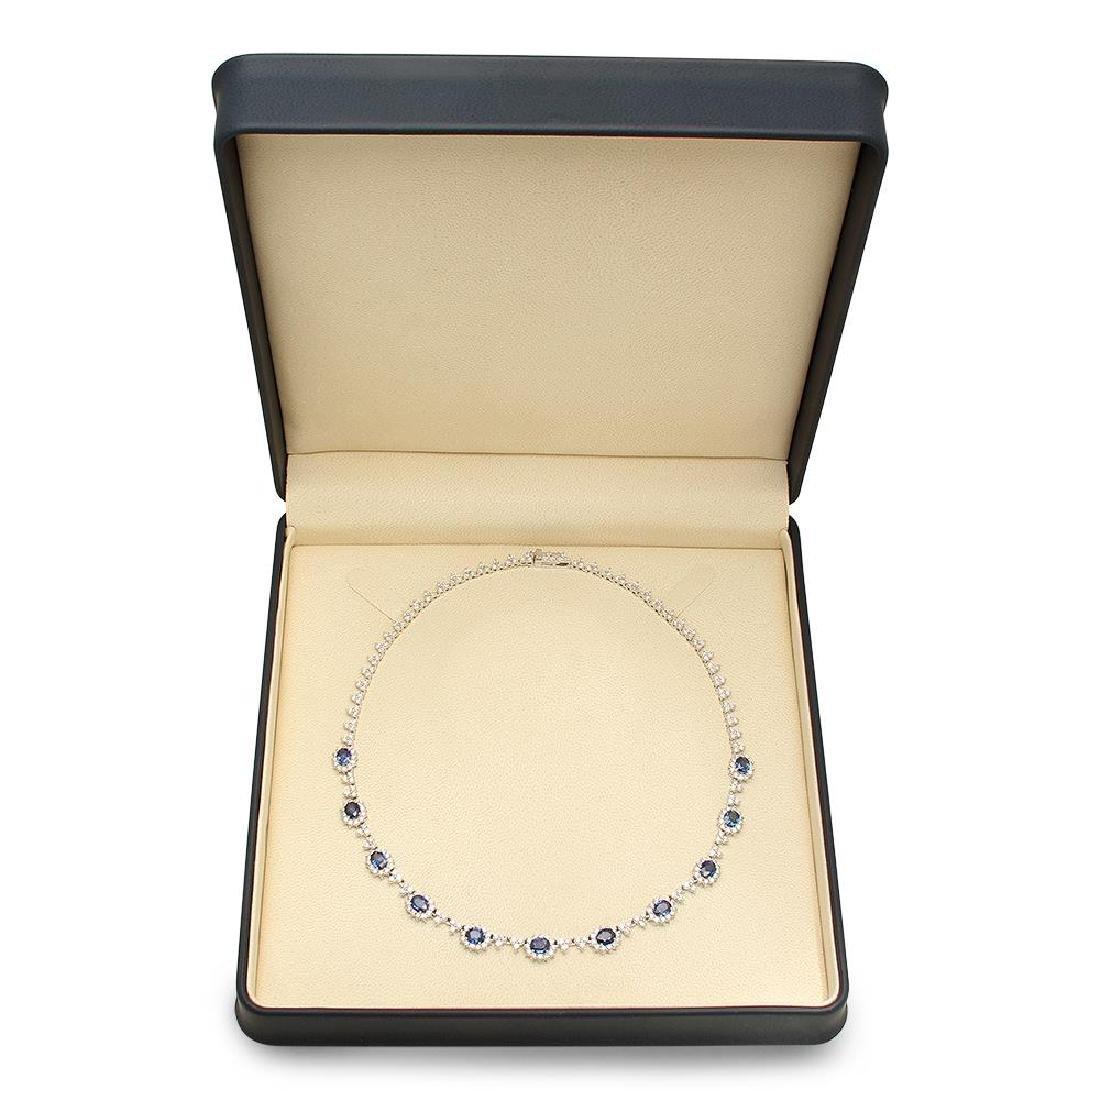 14K Gold 7.88ct Sapphire 8.79cts Diamond Necklace - 4